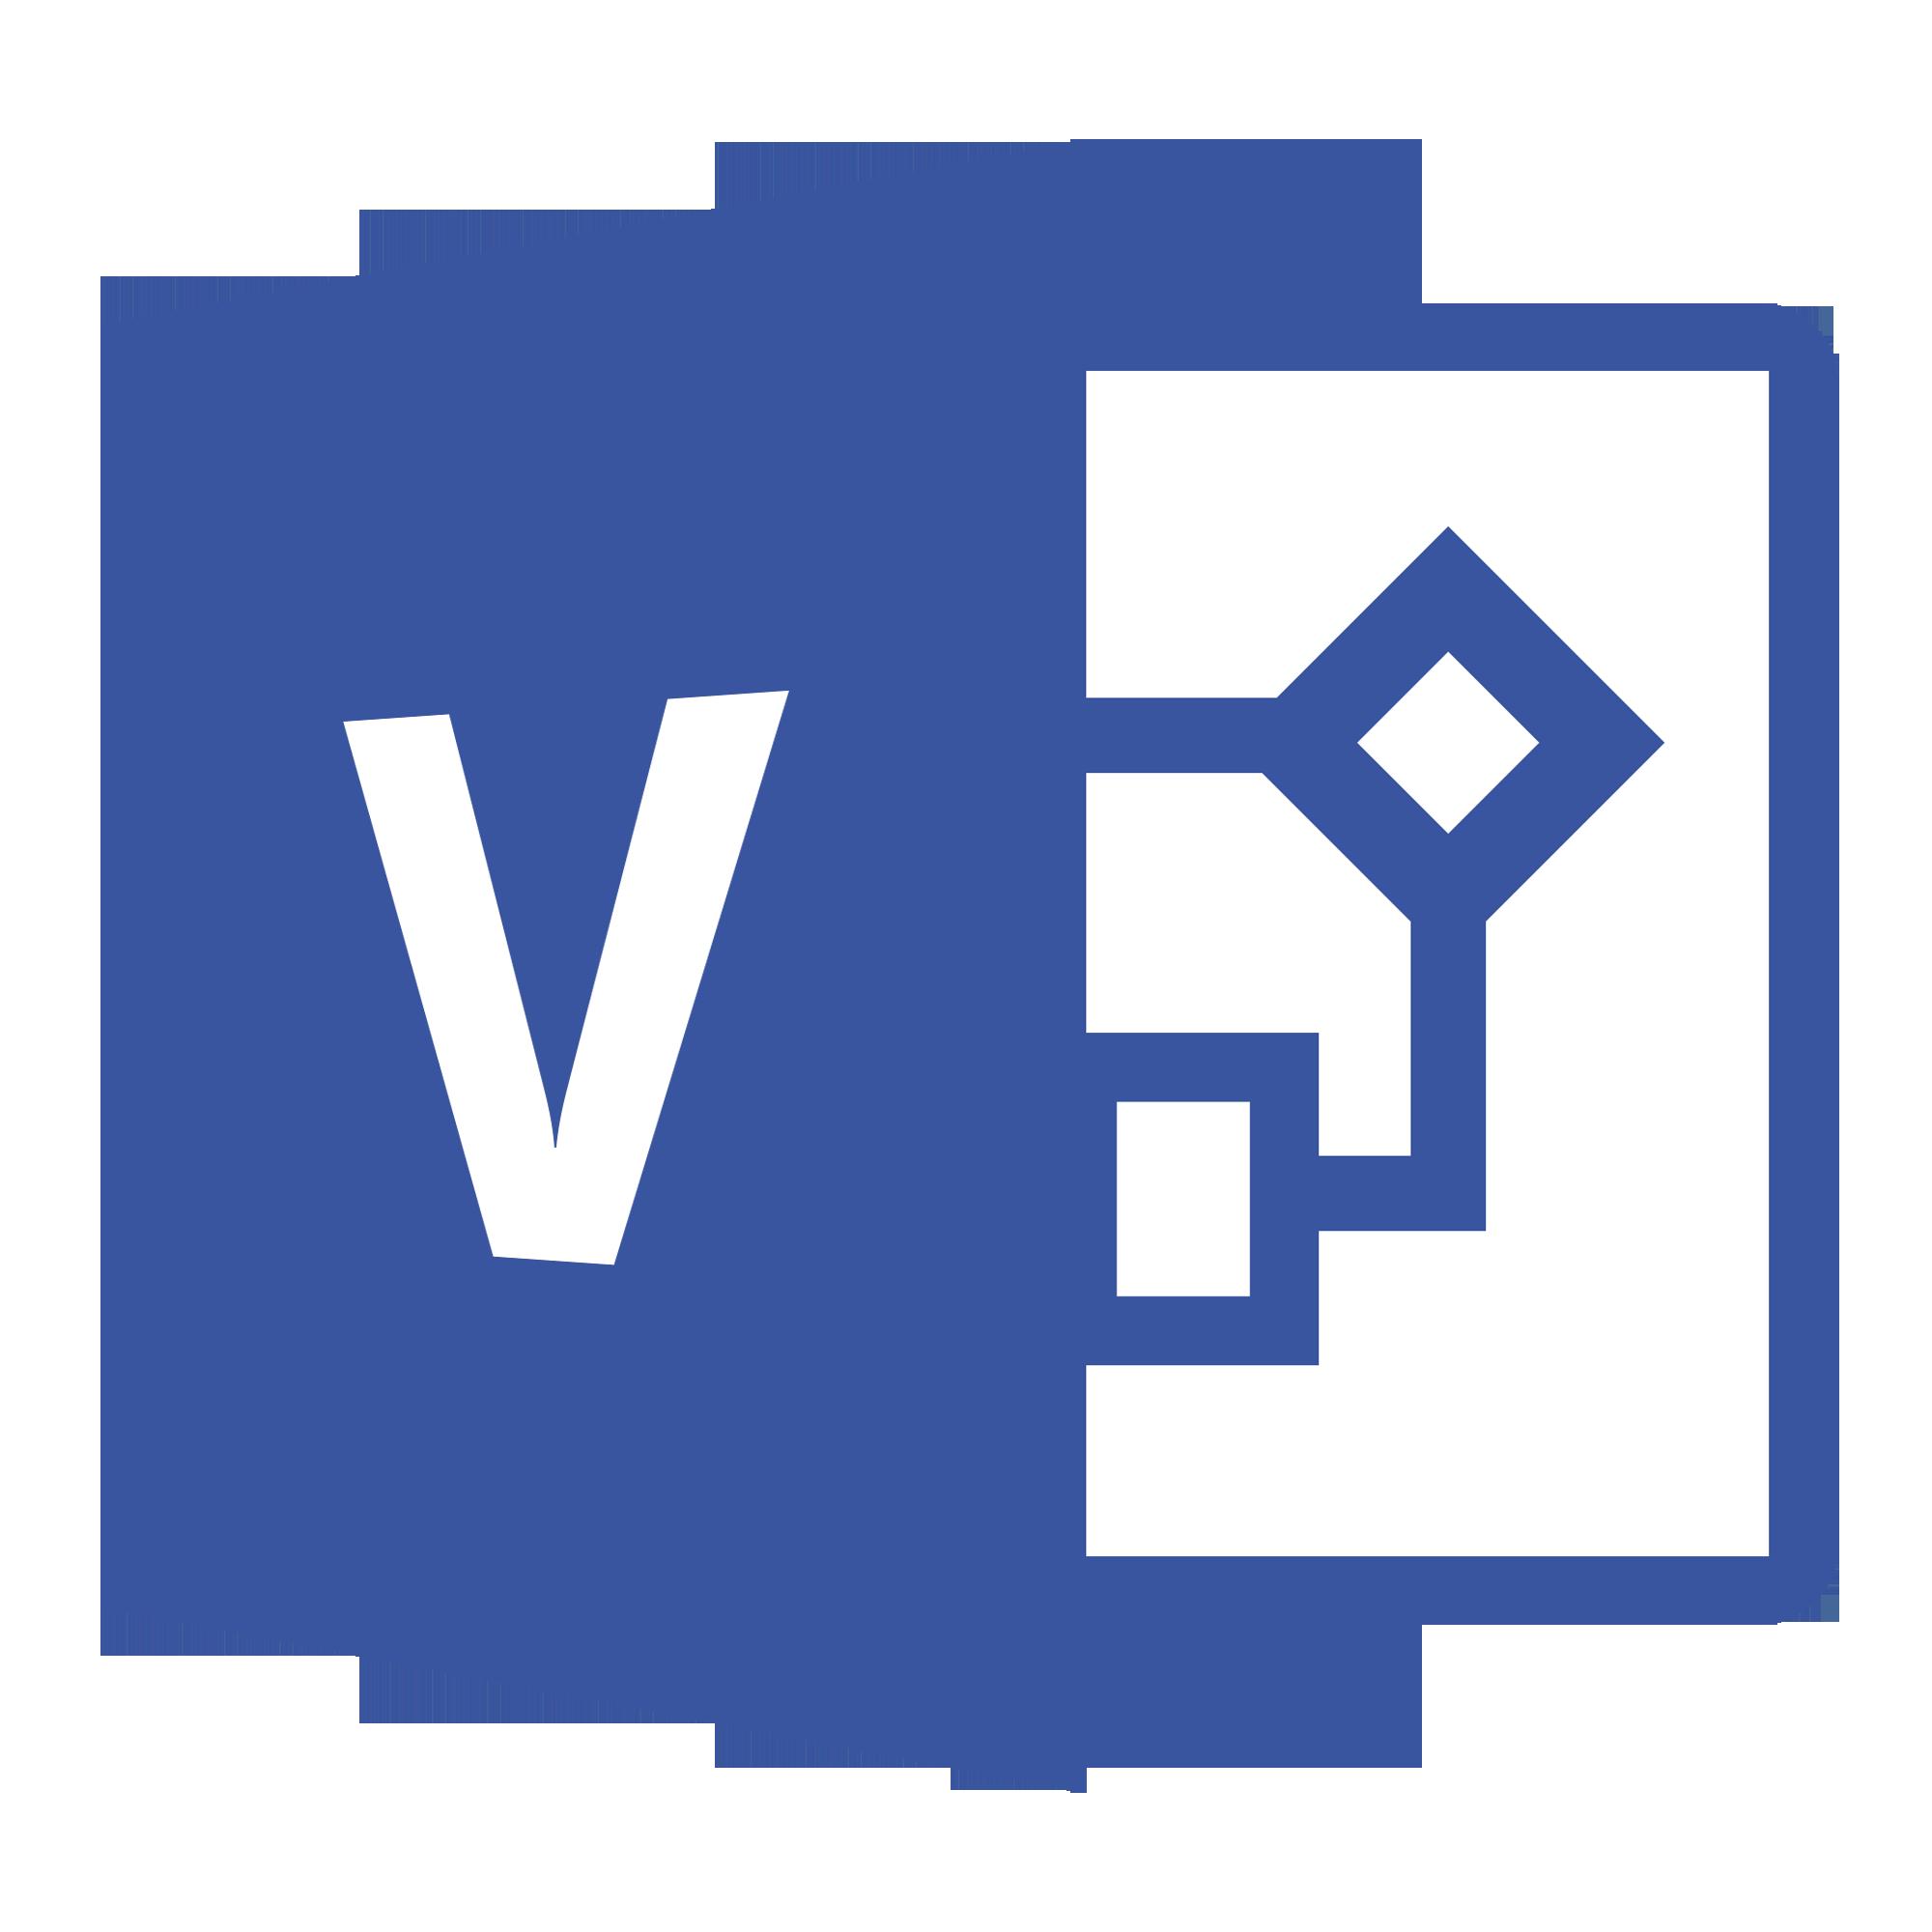 Microsoft visio professional 2013 построена на базе visio standard 2013